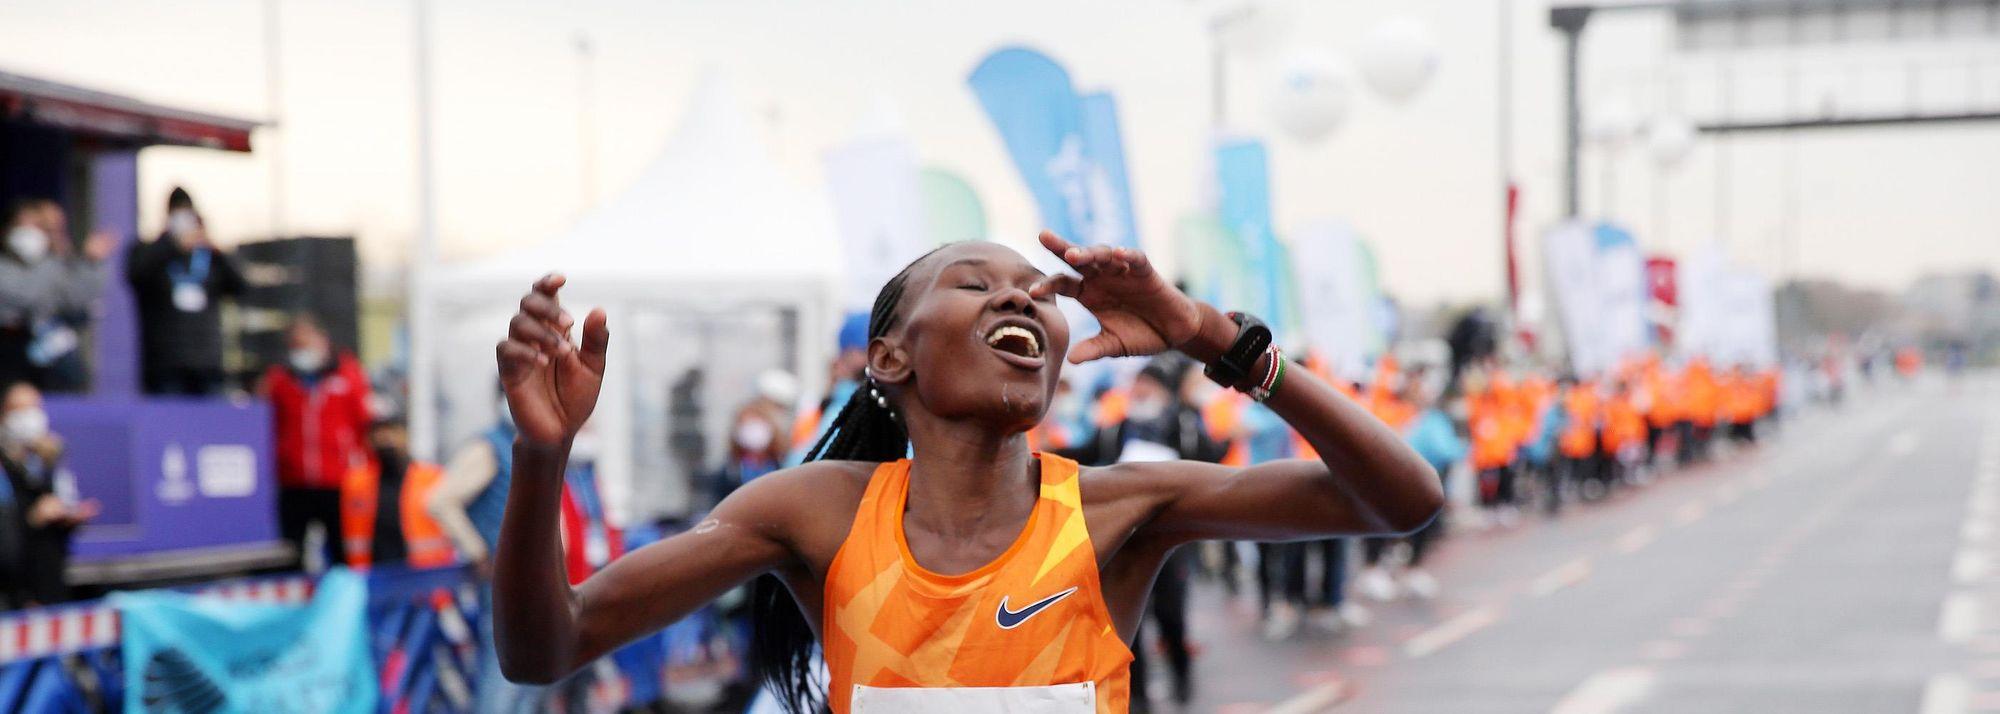 World marathon champion Ruth Chepngetich took 29 seconds off the world record to win the N Kolay Istanbul Half Marathon, a World Athletics Elite Label road race, clocking a stunning 1:04:02 in the Turkish city on Sunday (4).